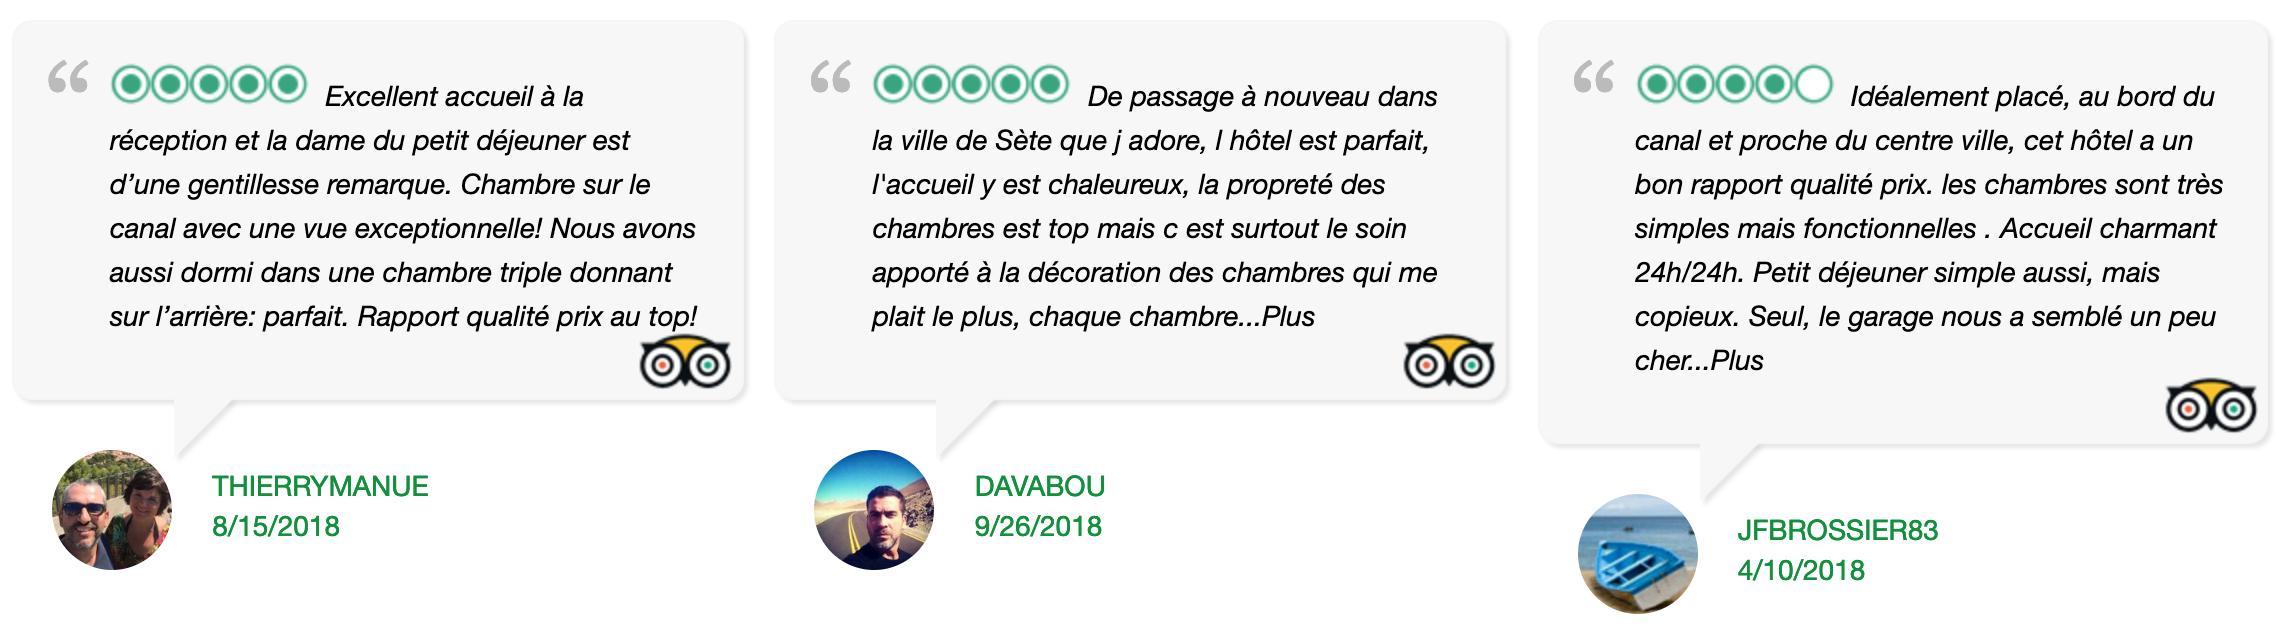 Avis Tripadvisor Hôtel L'Orque Bleue